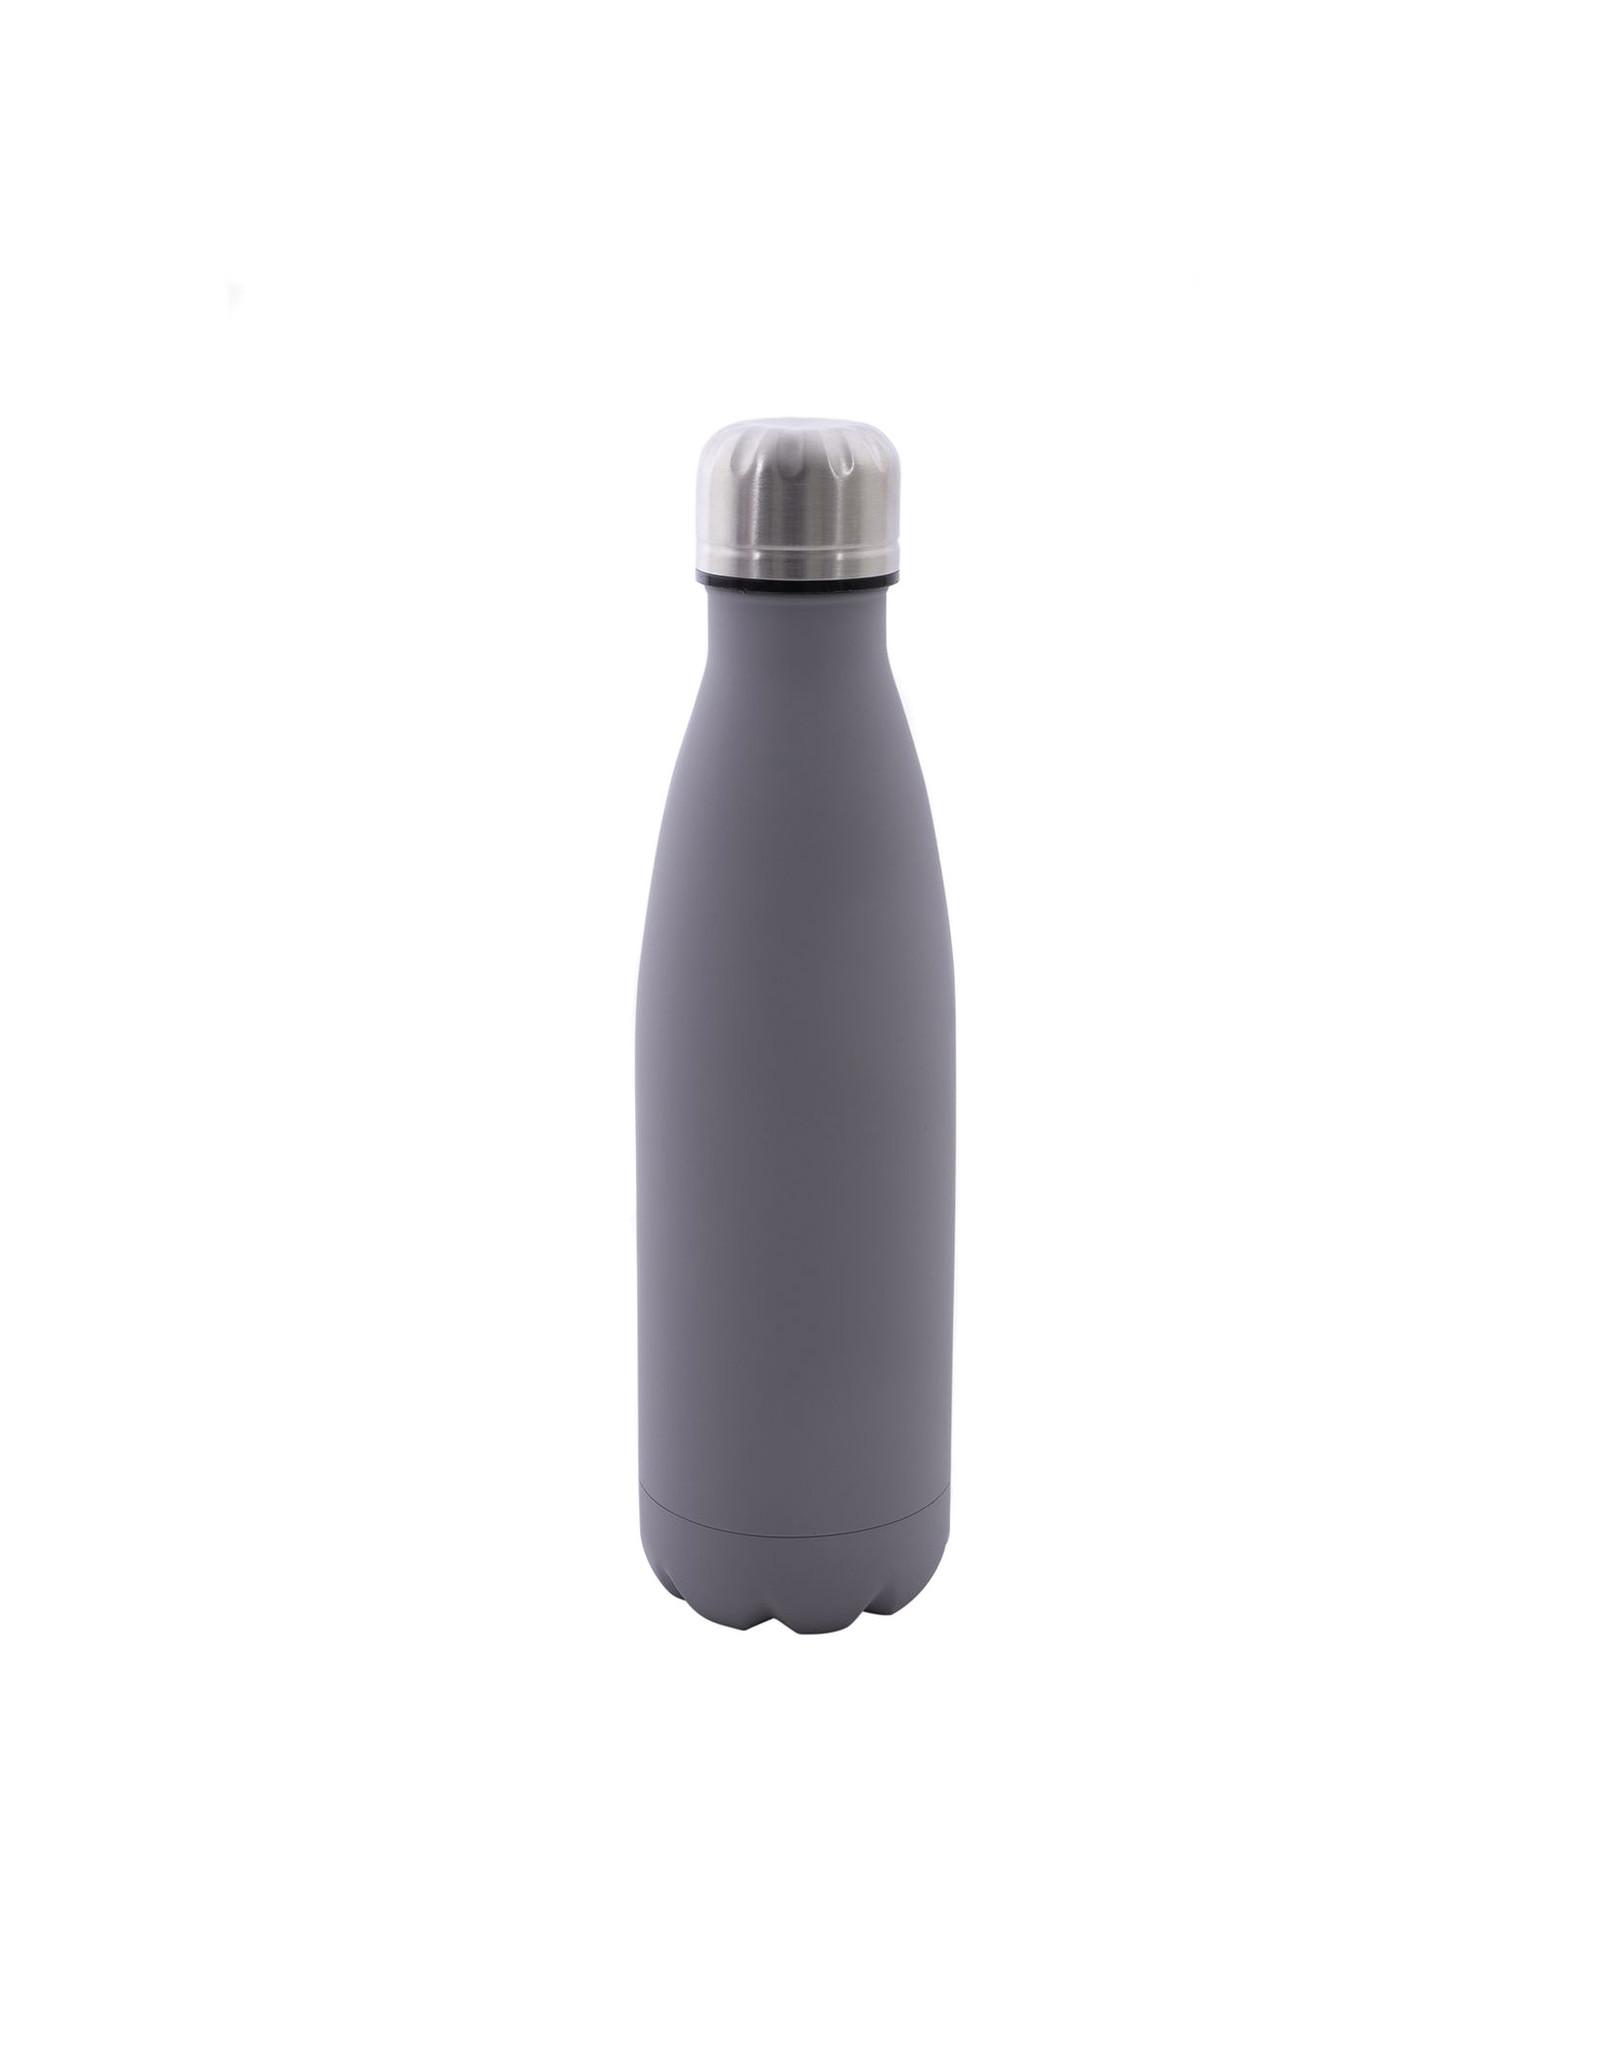 Dubbelwandige fles RVS mat grijs